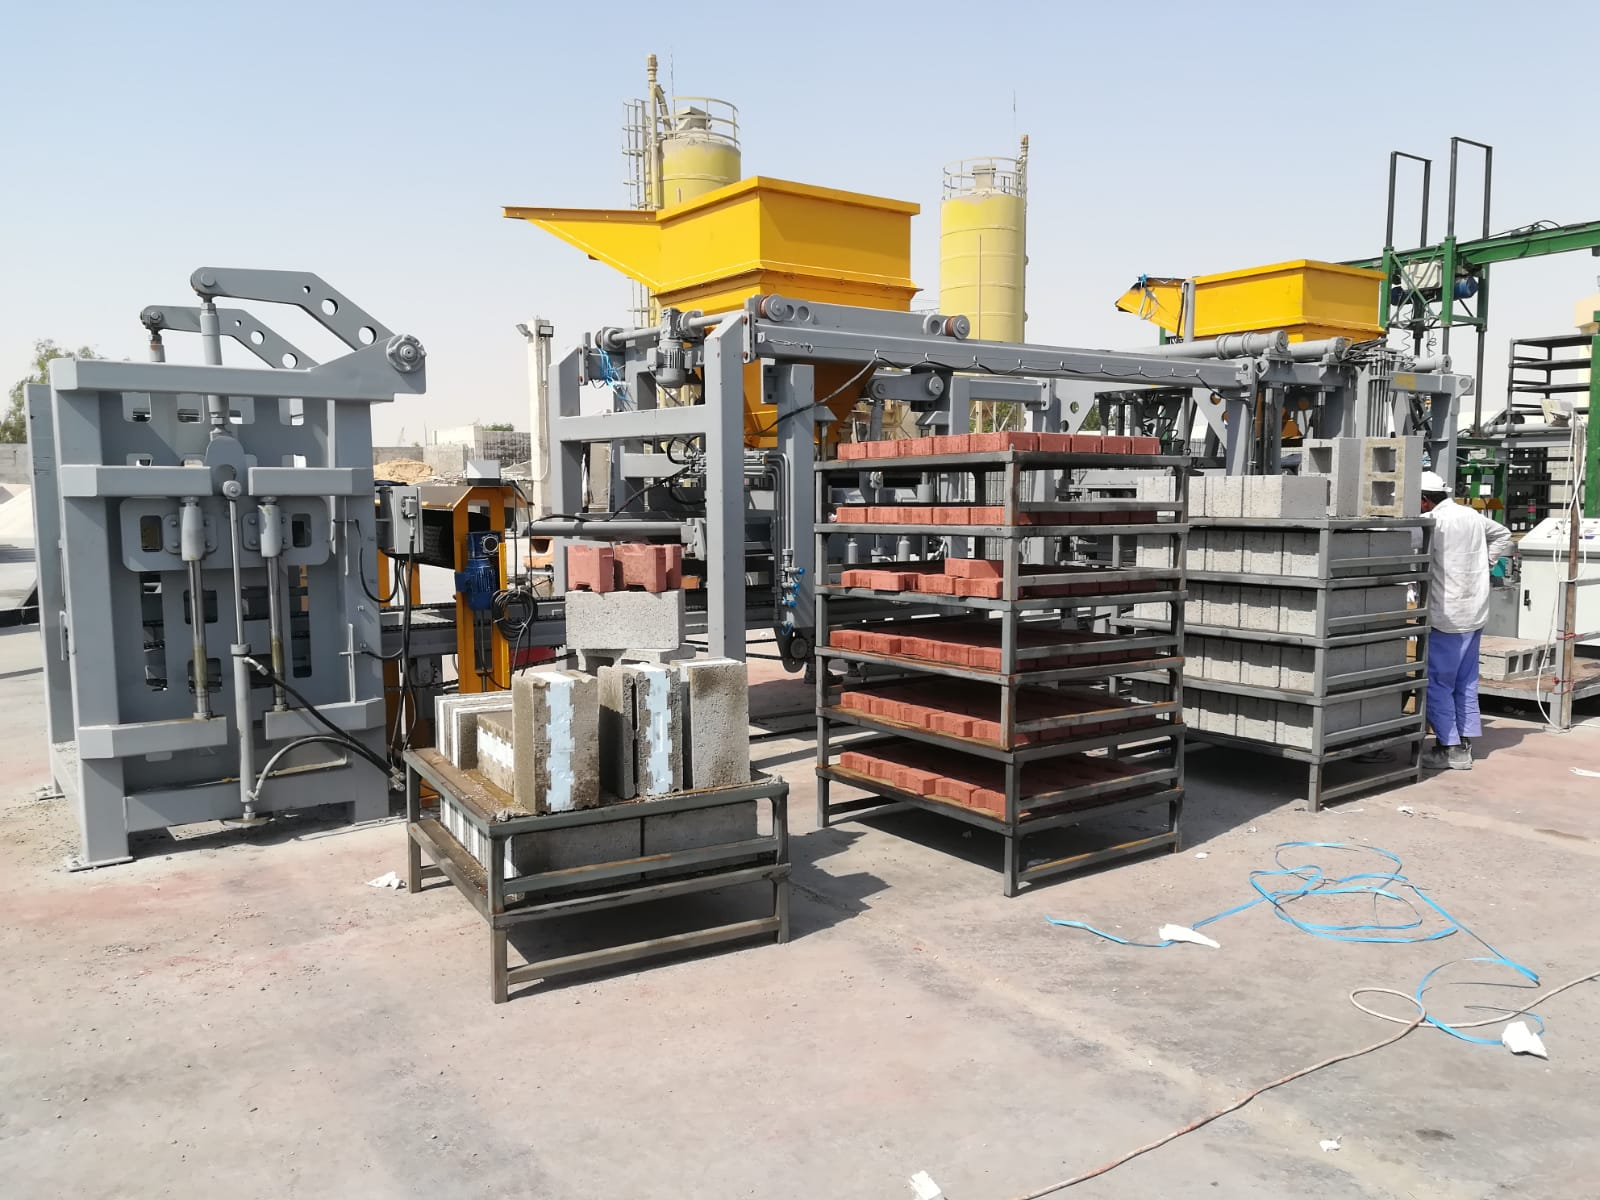 Alkhor Block Factory - Mr. Ali